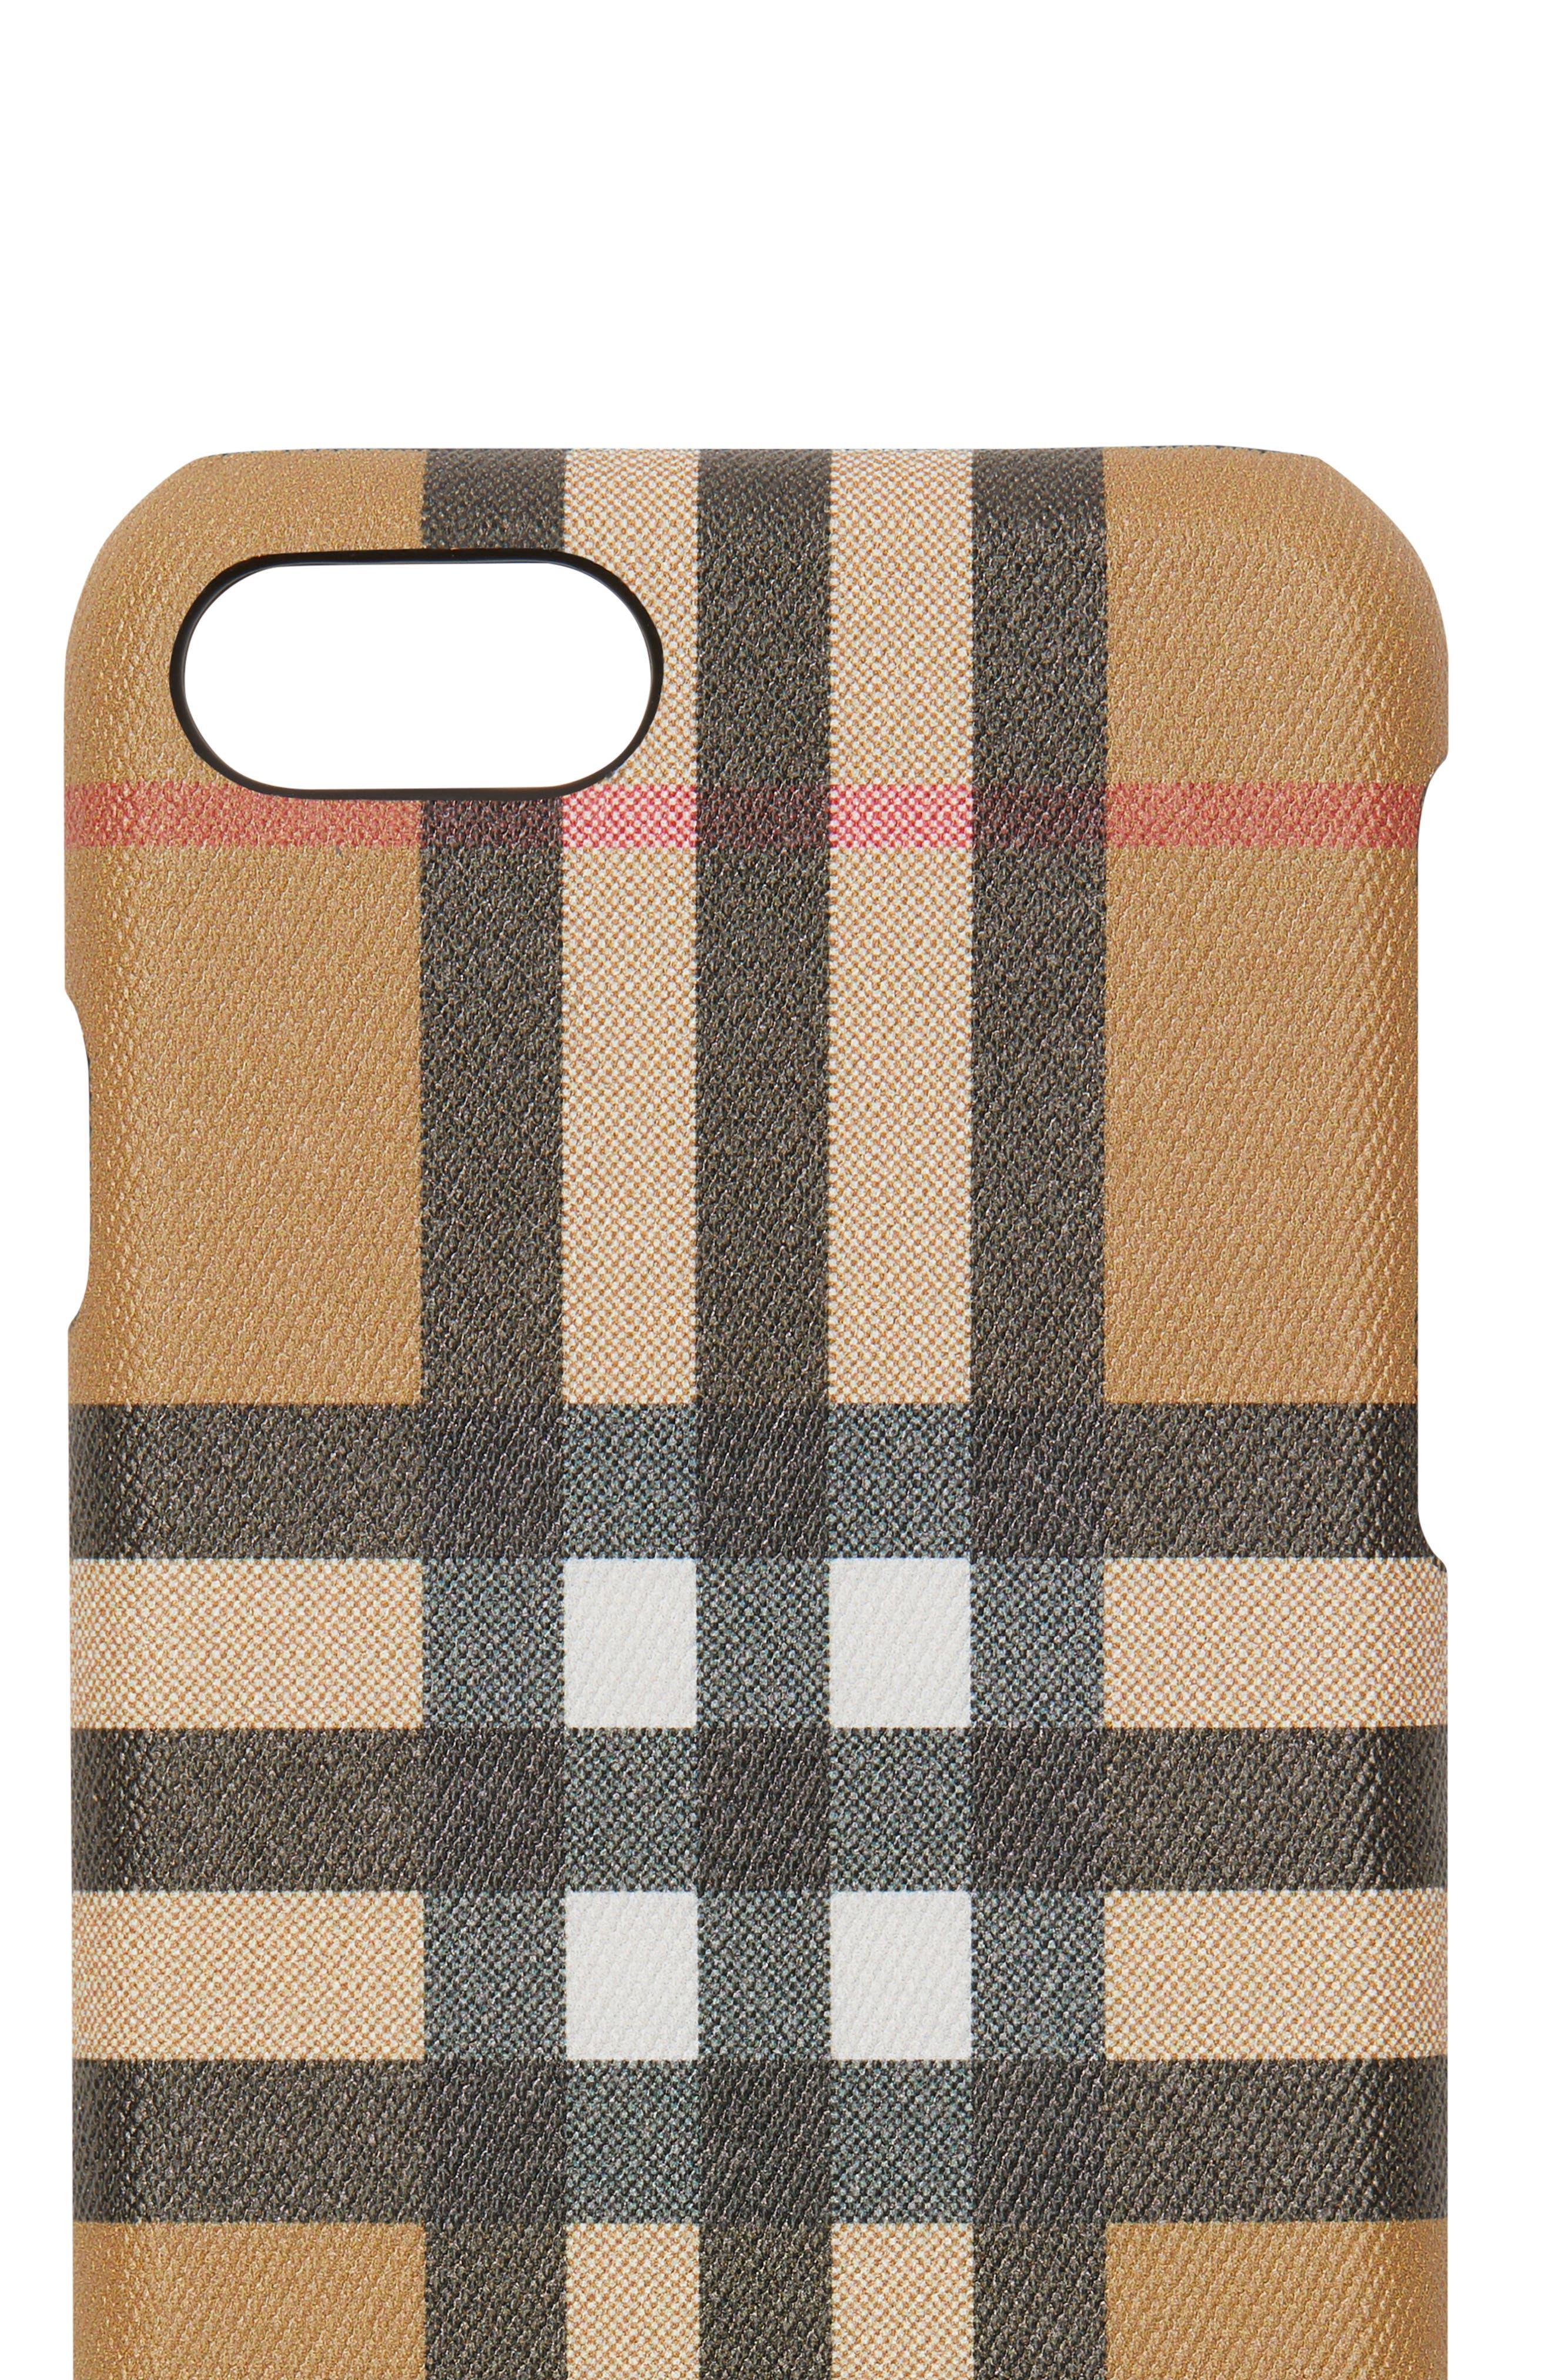 Vintage Check iPhone 8 Case,                             Alternate thumbnail 3, color,                             001